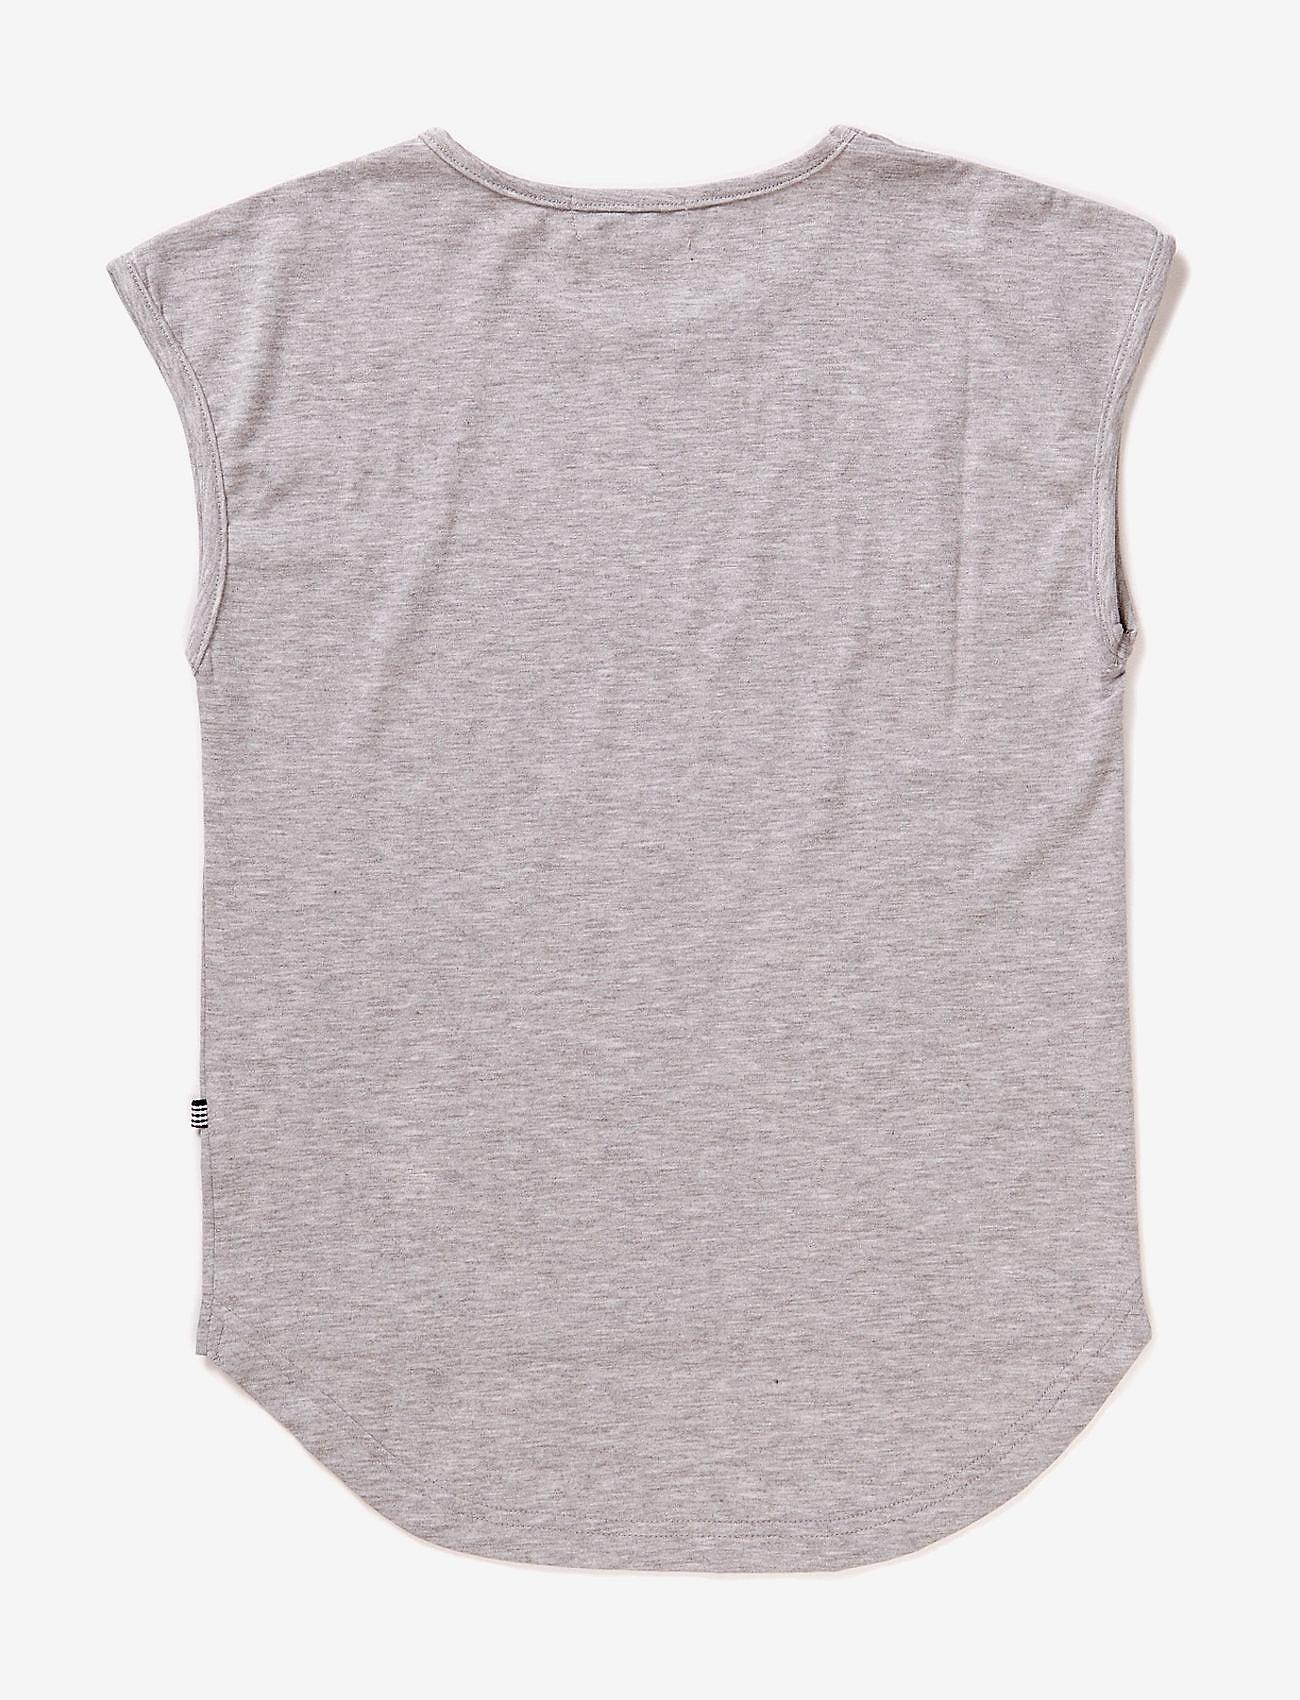 Hust & Claire - T-shirt, - bez piedurknēm - pearl grey melange - 1